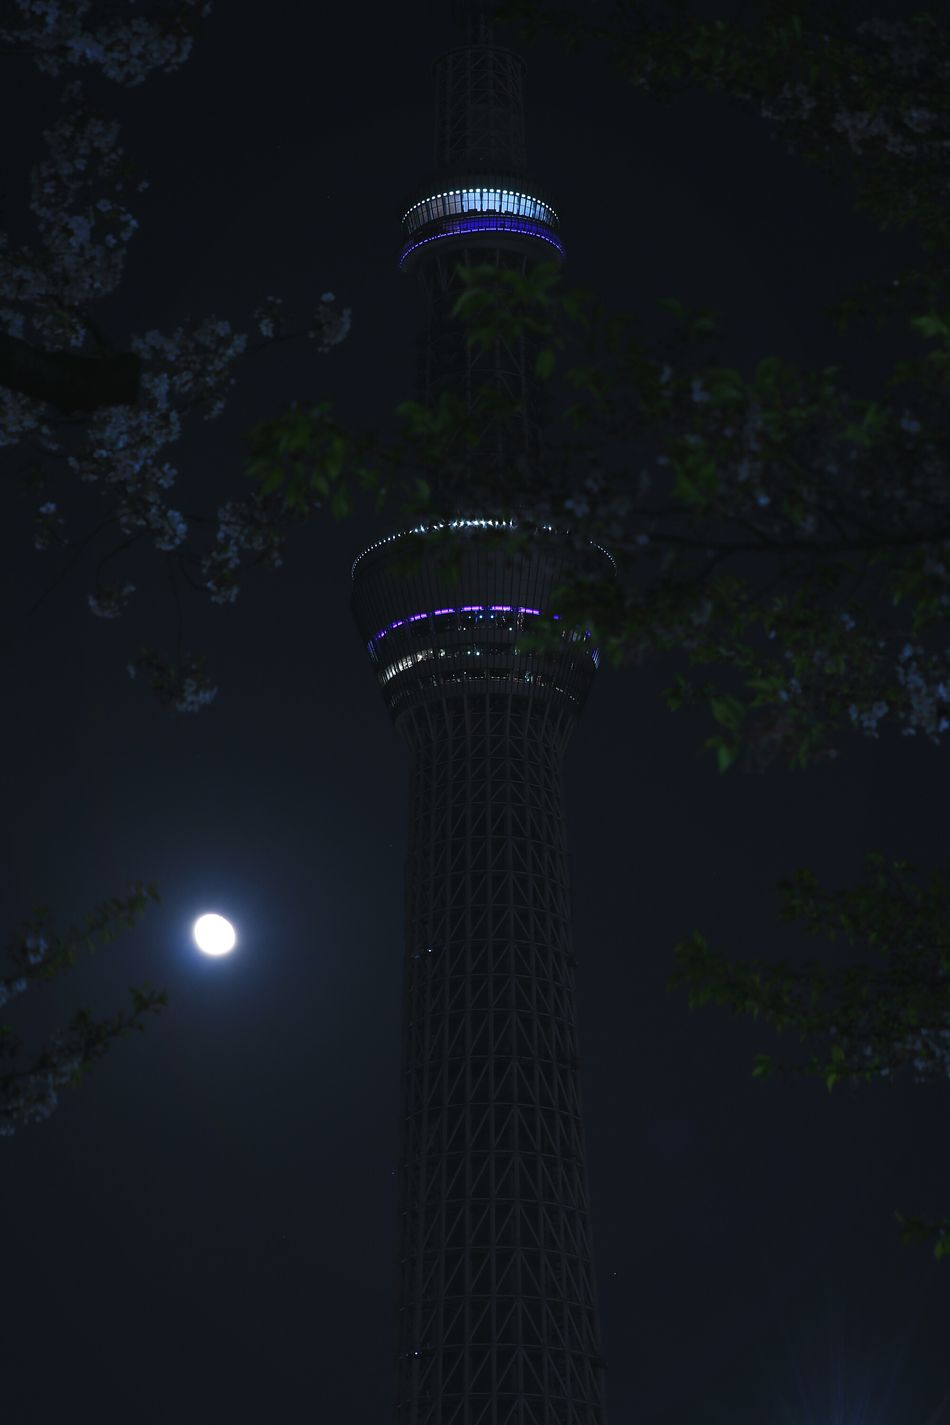 Night Tree Illuminated Tower Tokyoskytree Skytree Moon Nightview Nightscape Nightphotography Lighting Tokyo Cherry Blossom Sakura Blossom Japan Cherry Blossoms Sakura Blossom